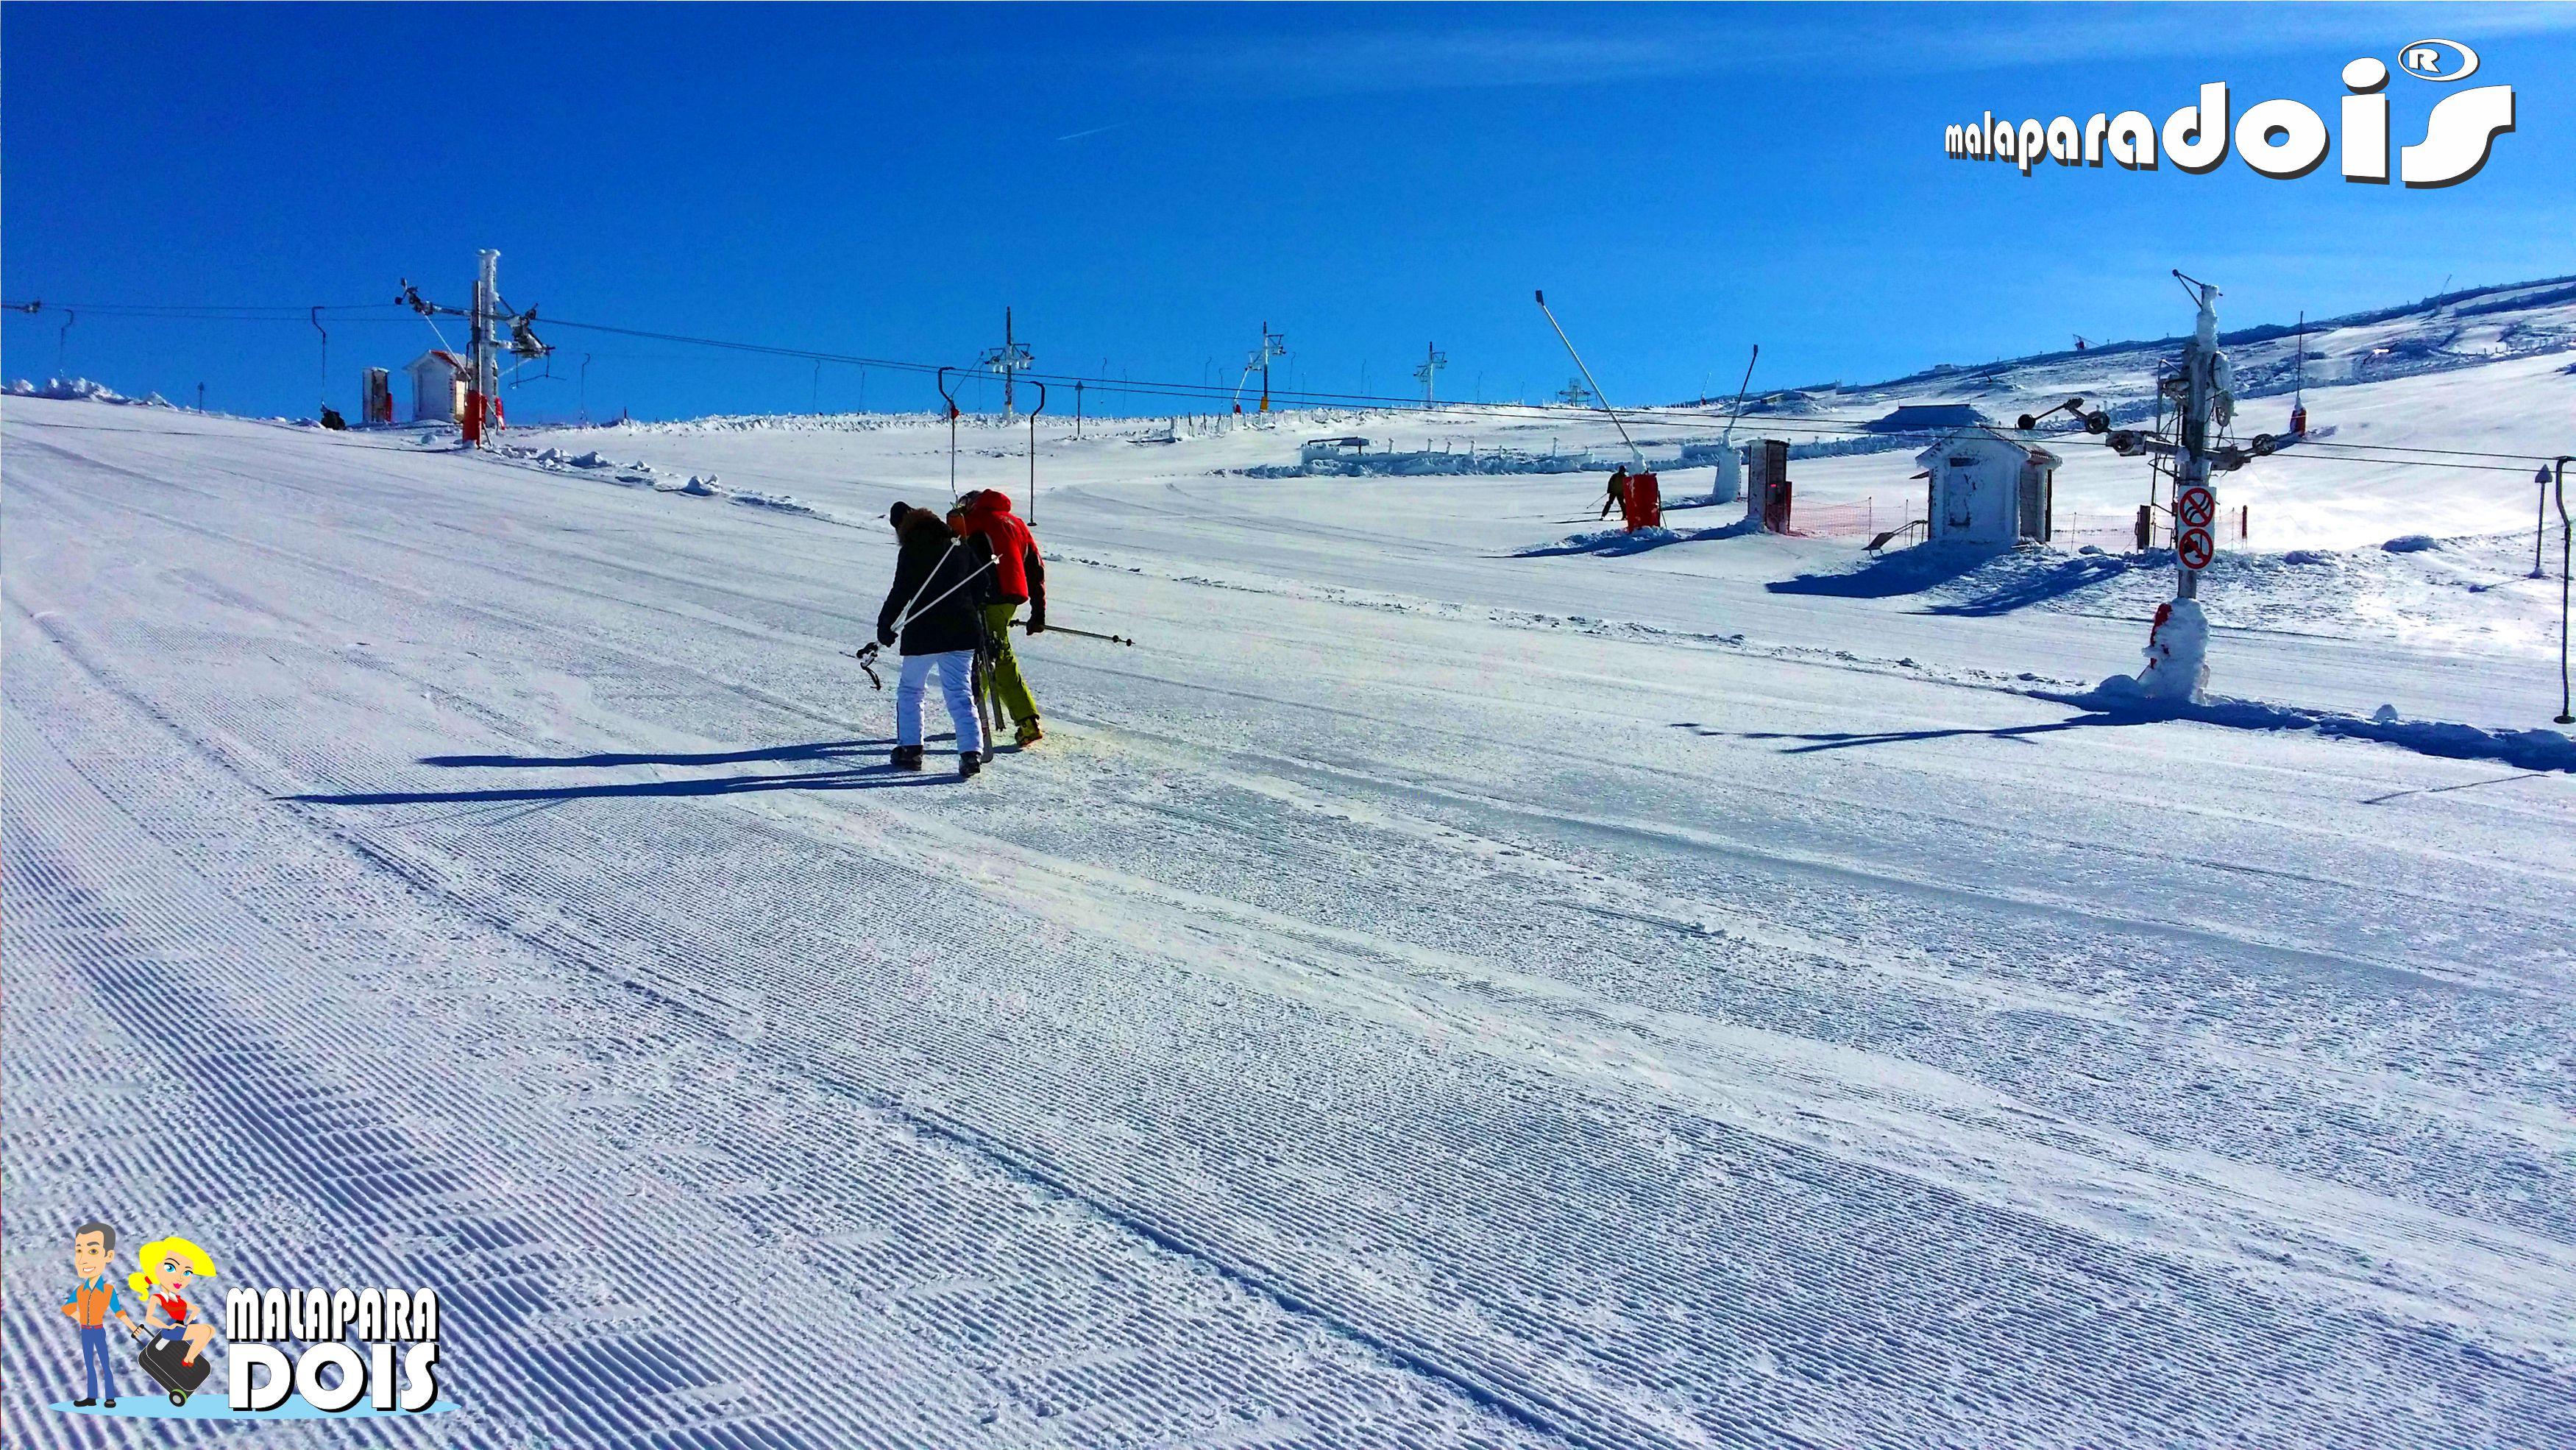 Aula de Ski - Flavia Ghelli 2.jpg